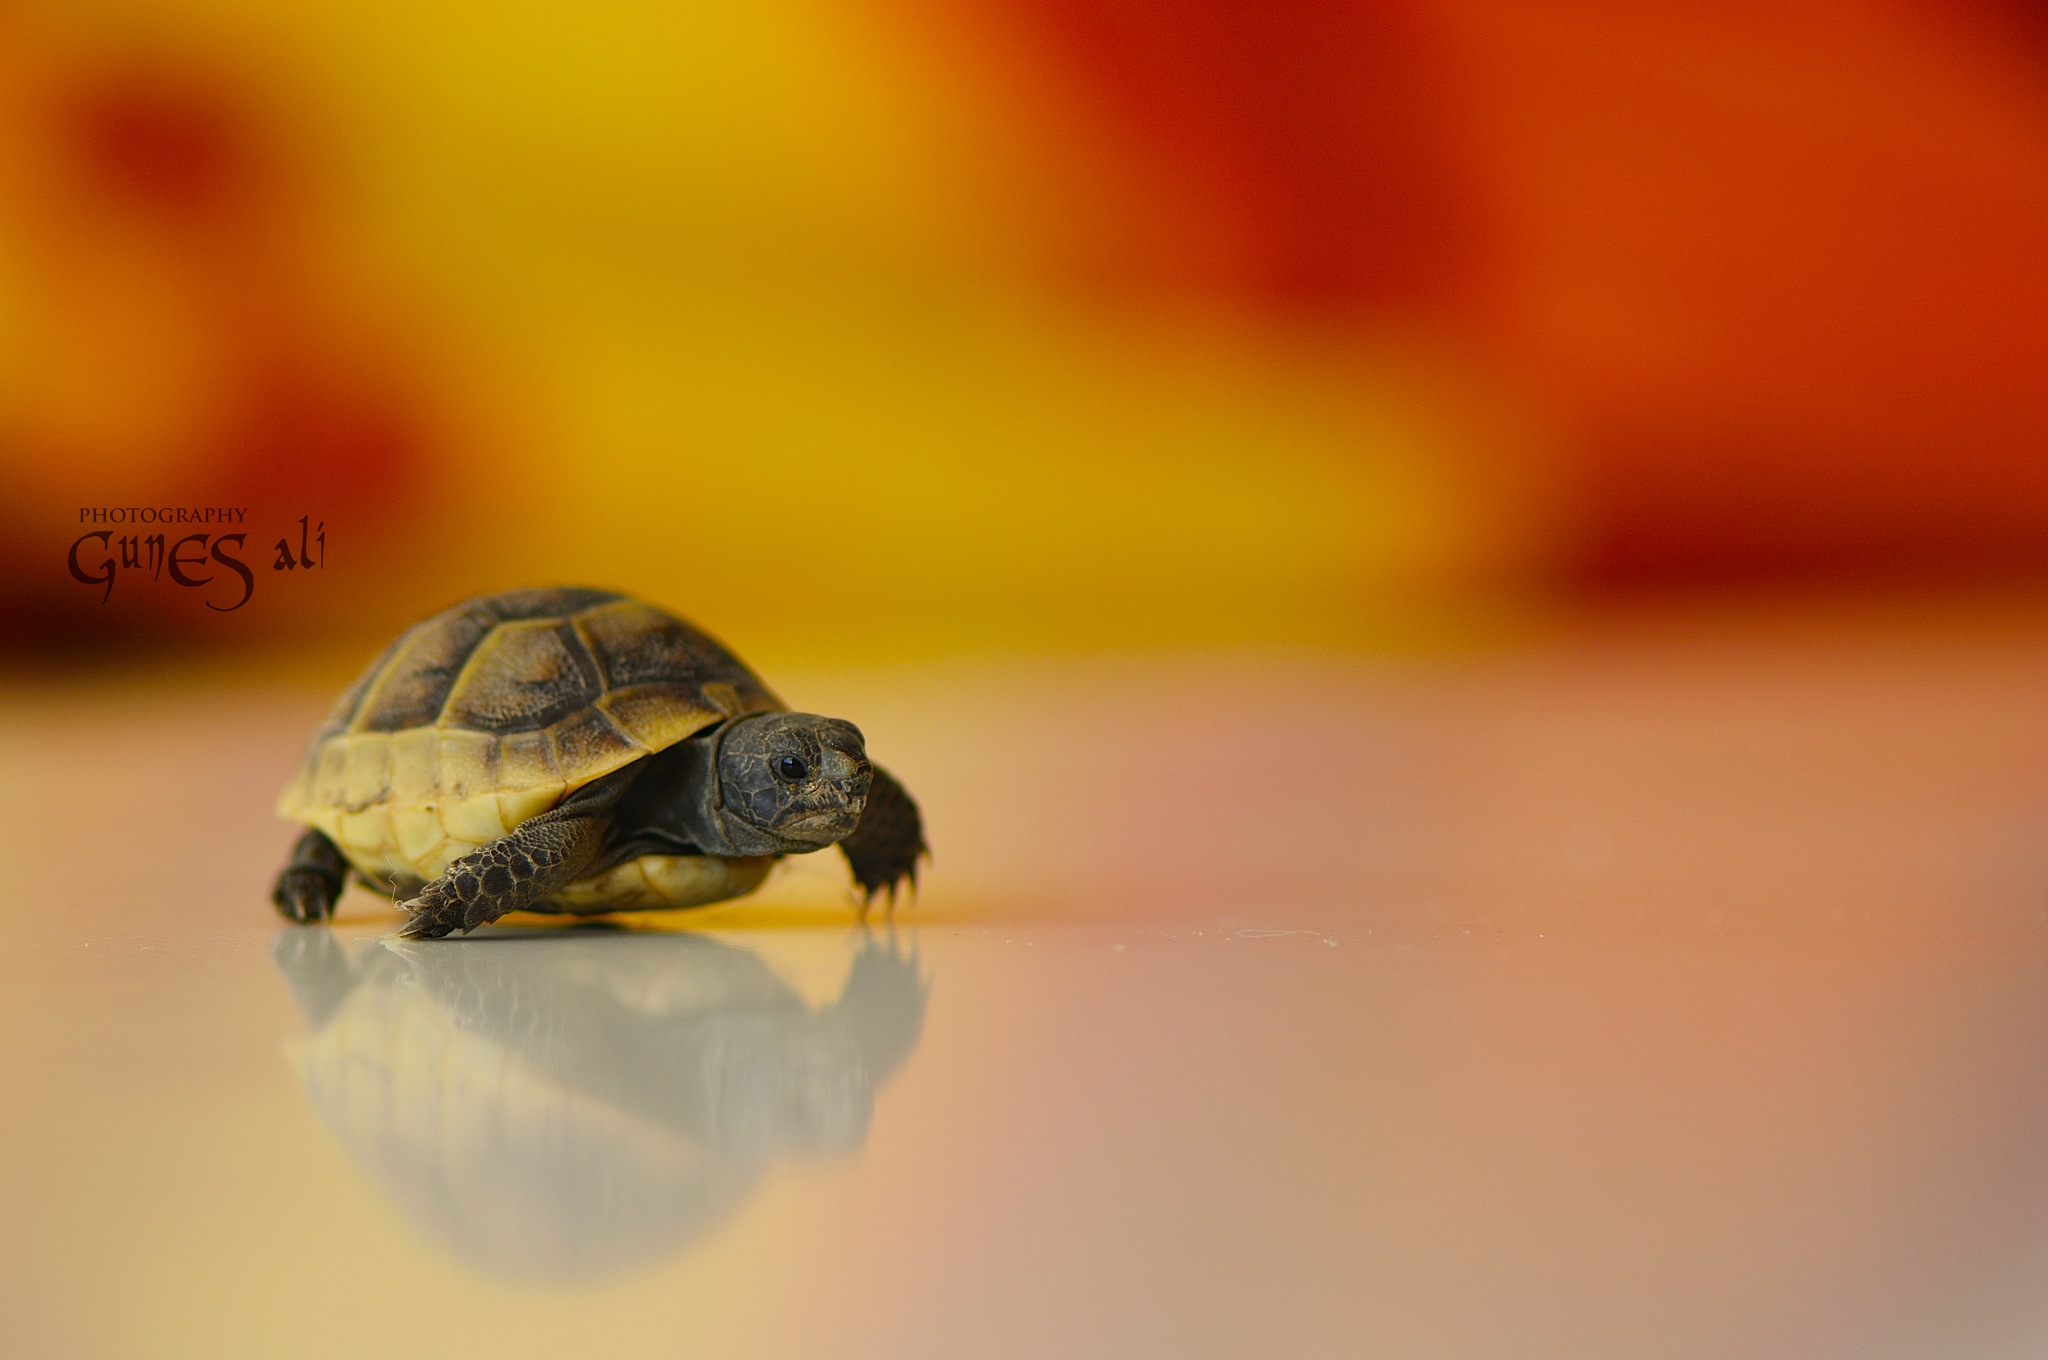 kaplumbağa by gunesali.photography